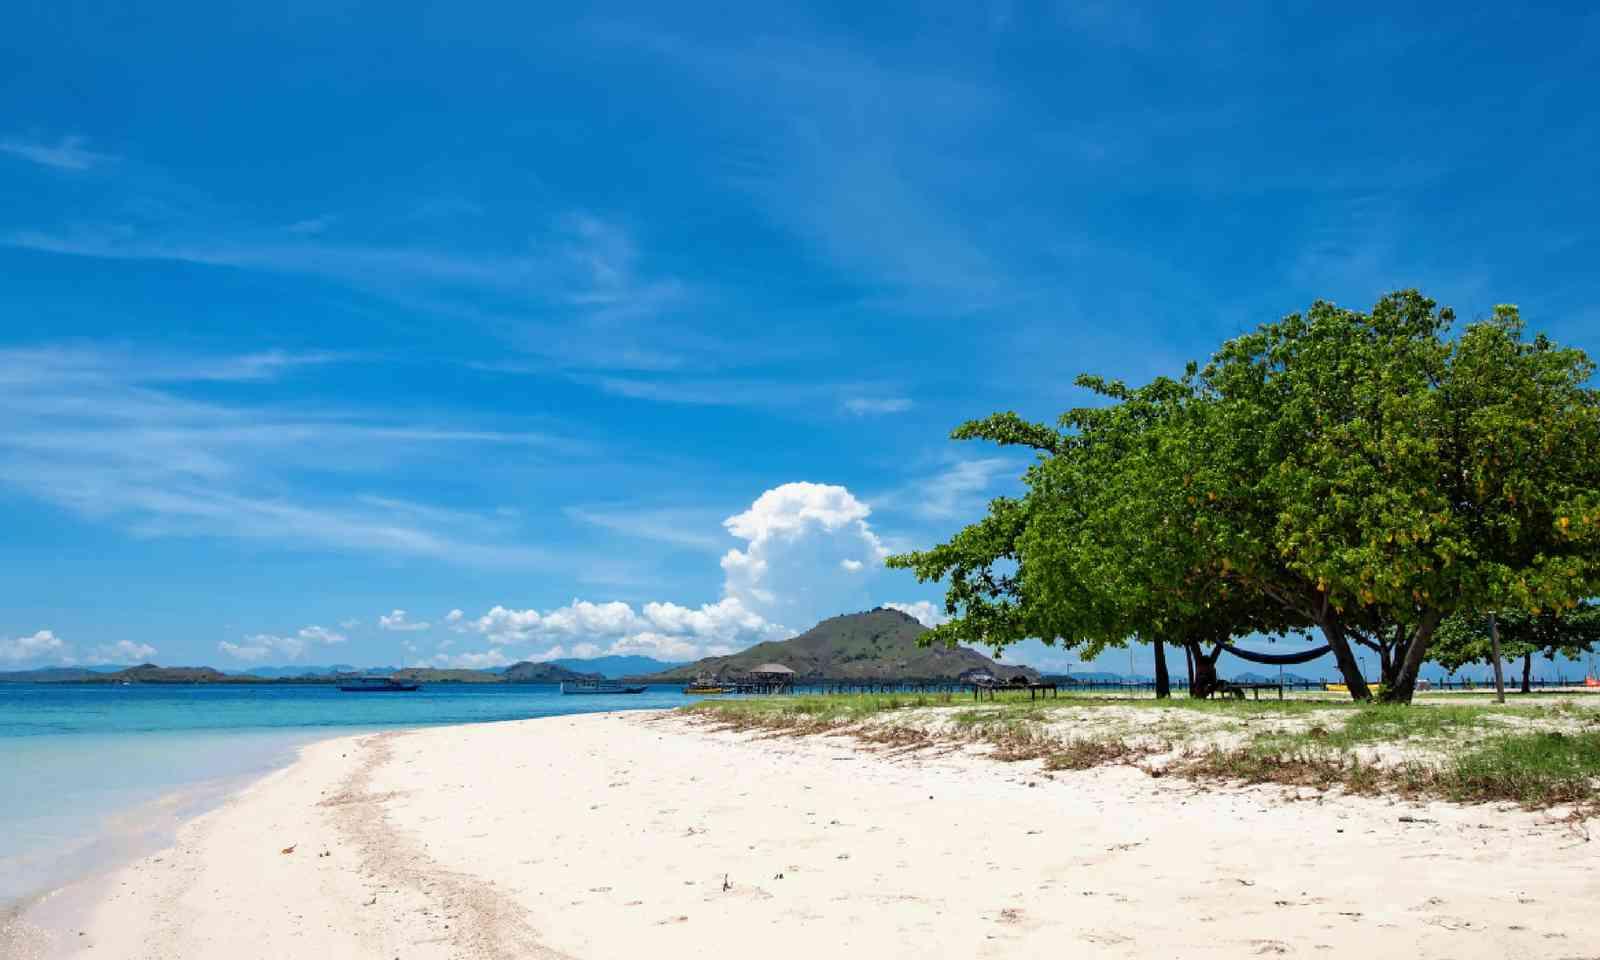 Kanawa island (Shutterstock)